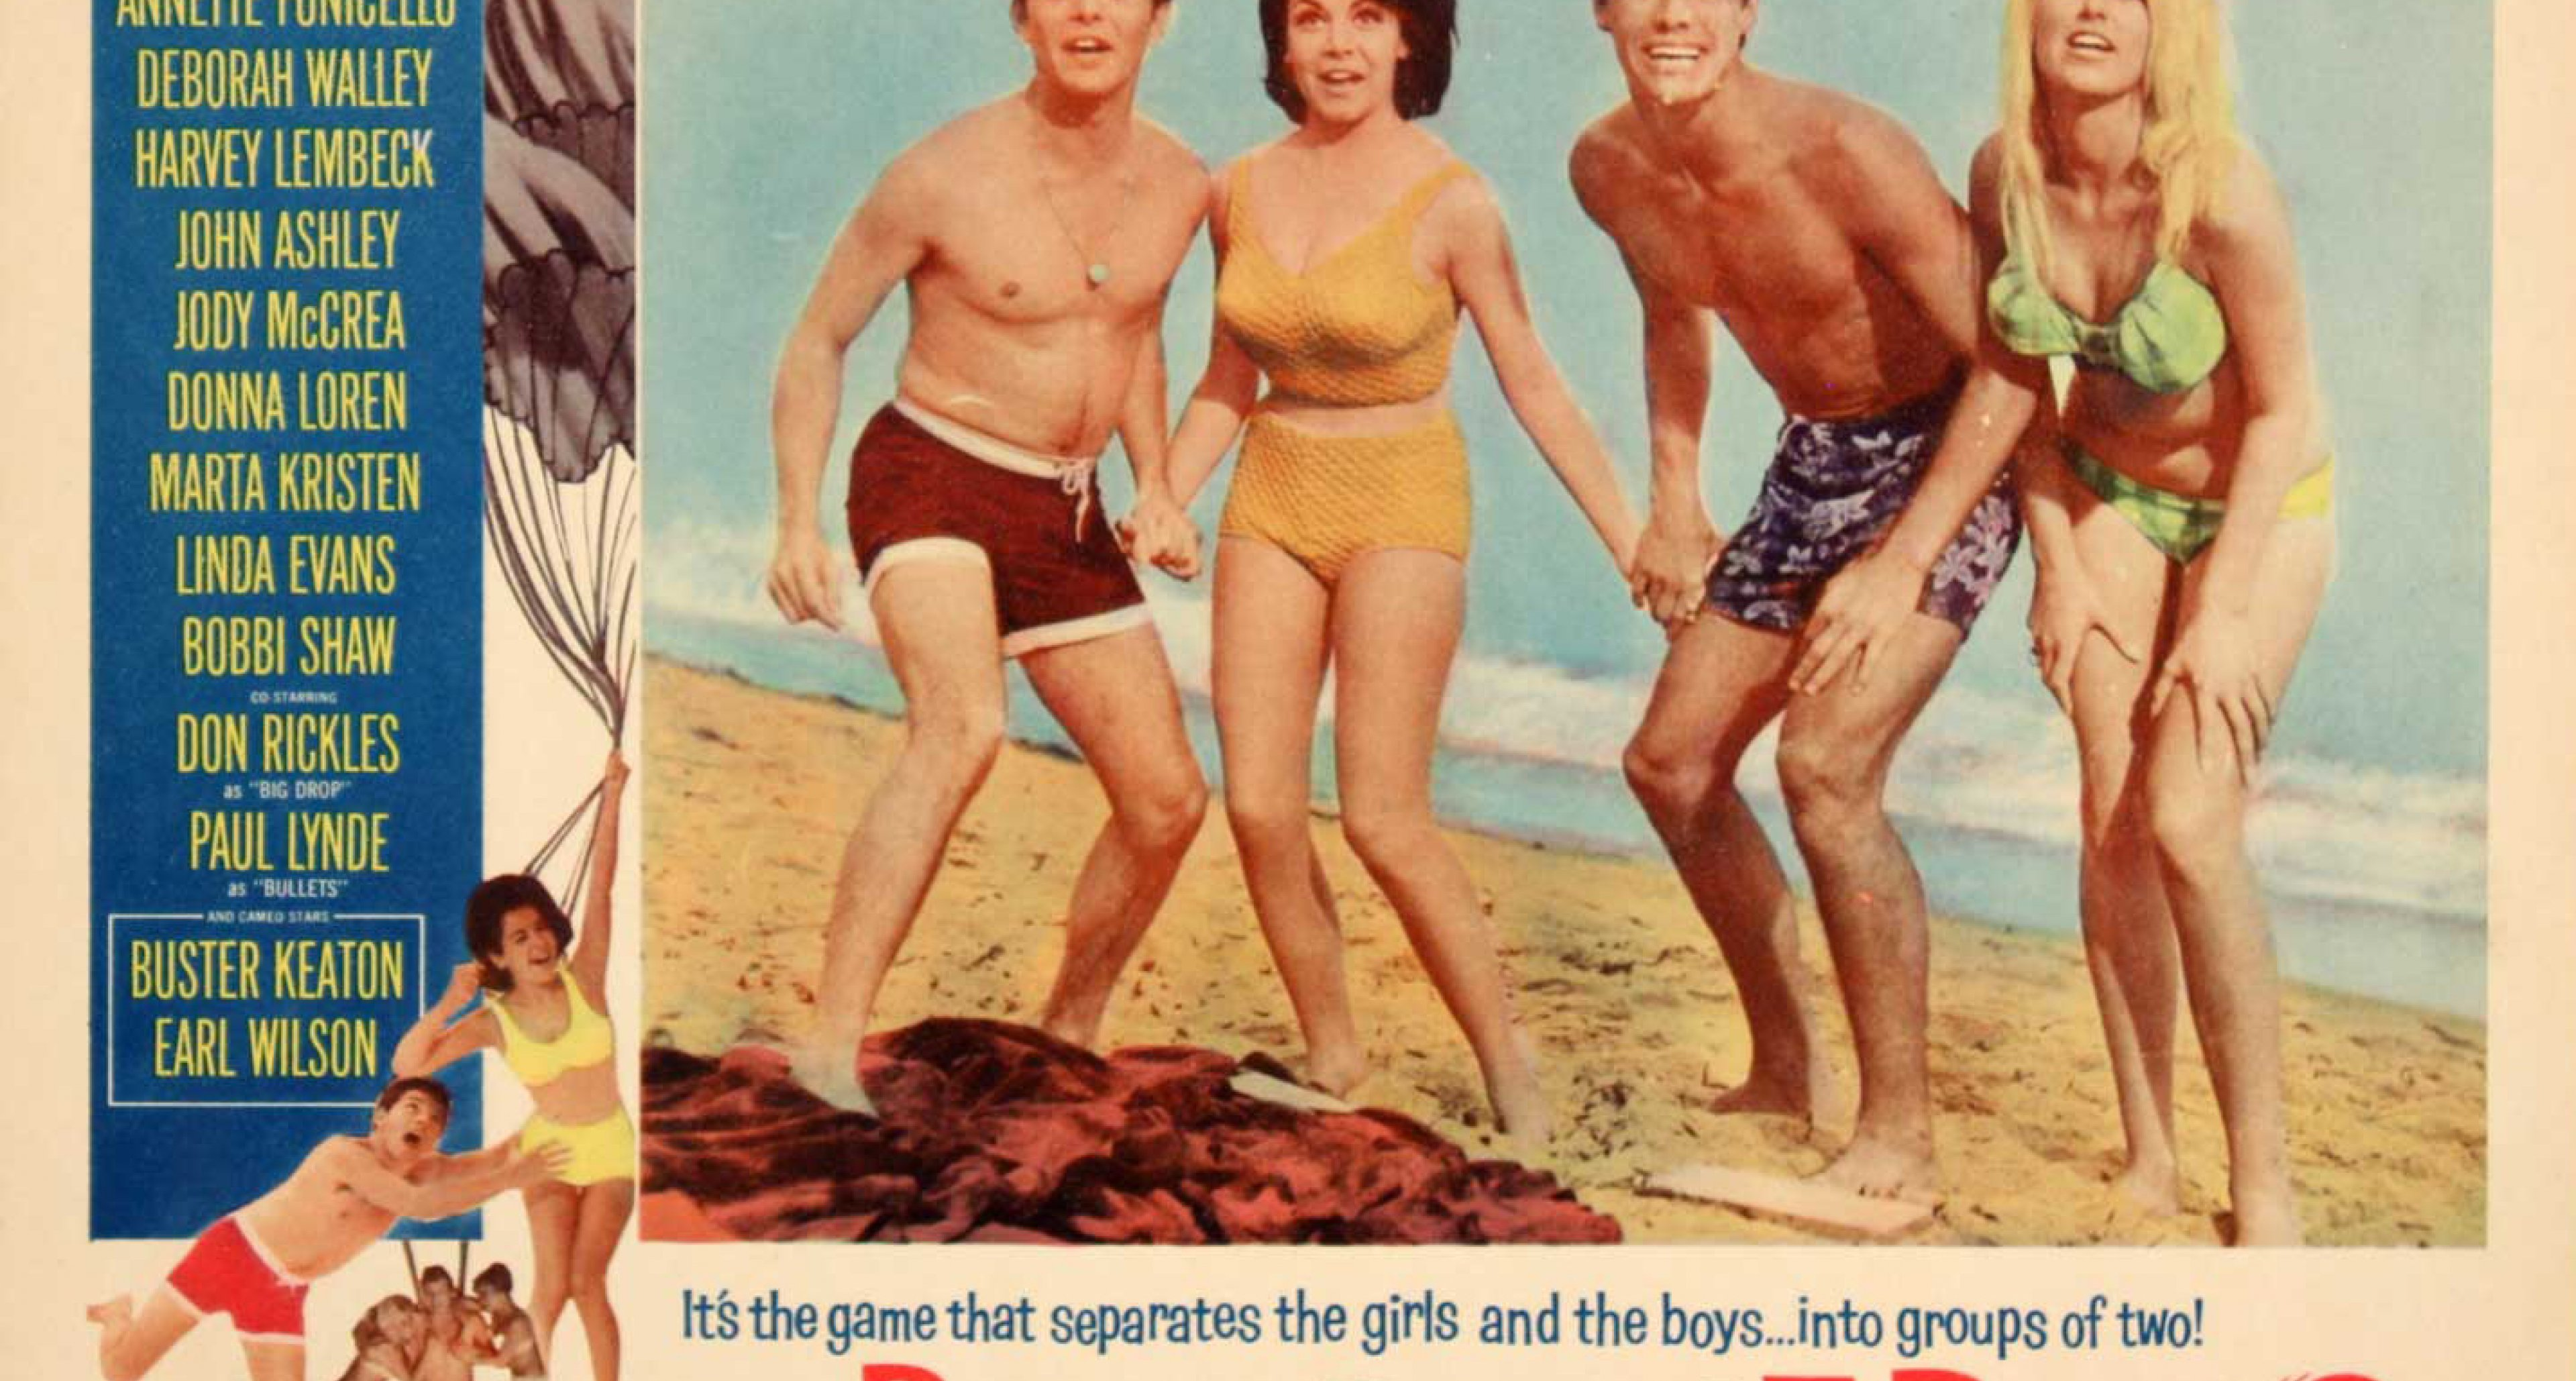 Artwork for beach party film 'Beach Blanket Bingo' starring Annette Funicello, 1965.